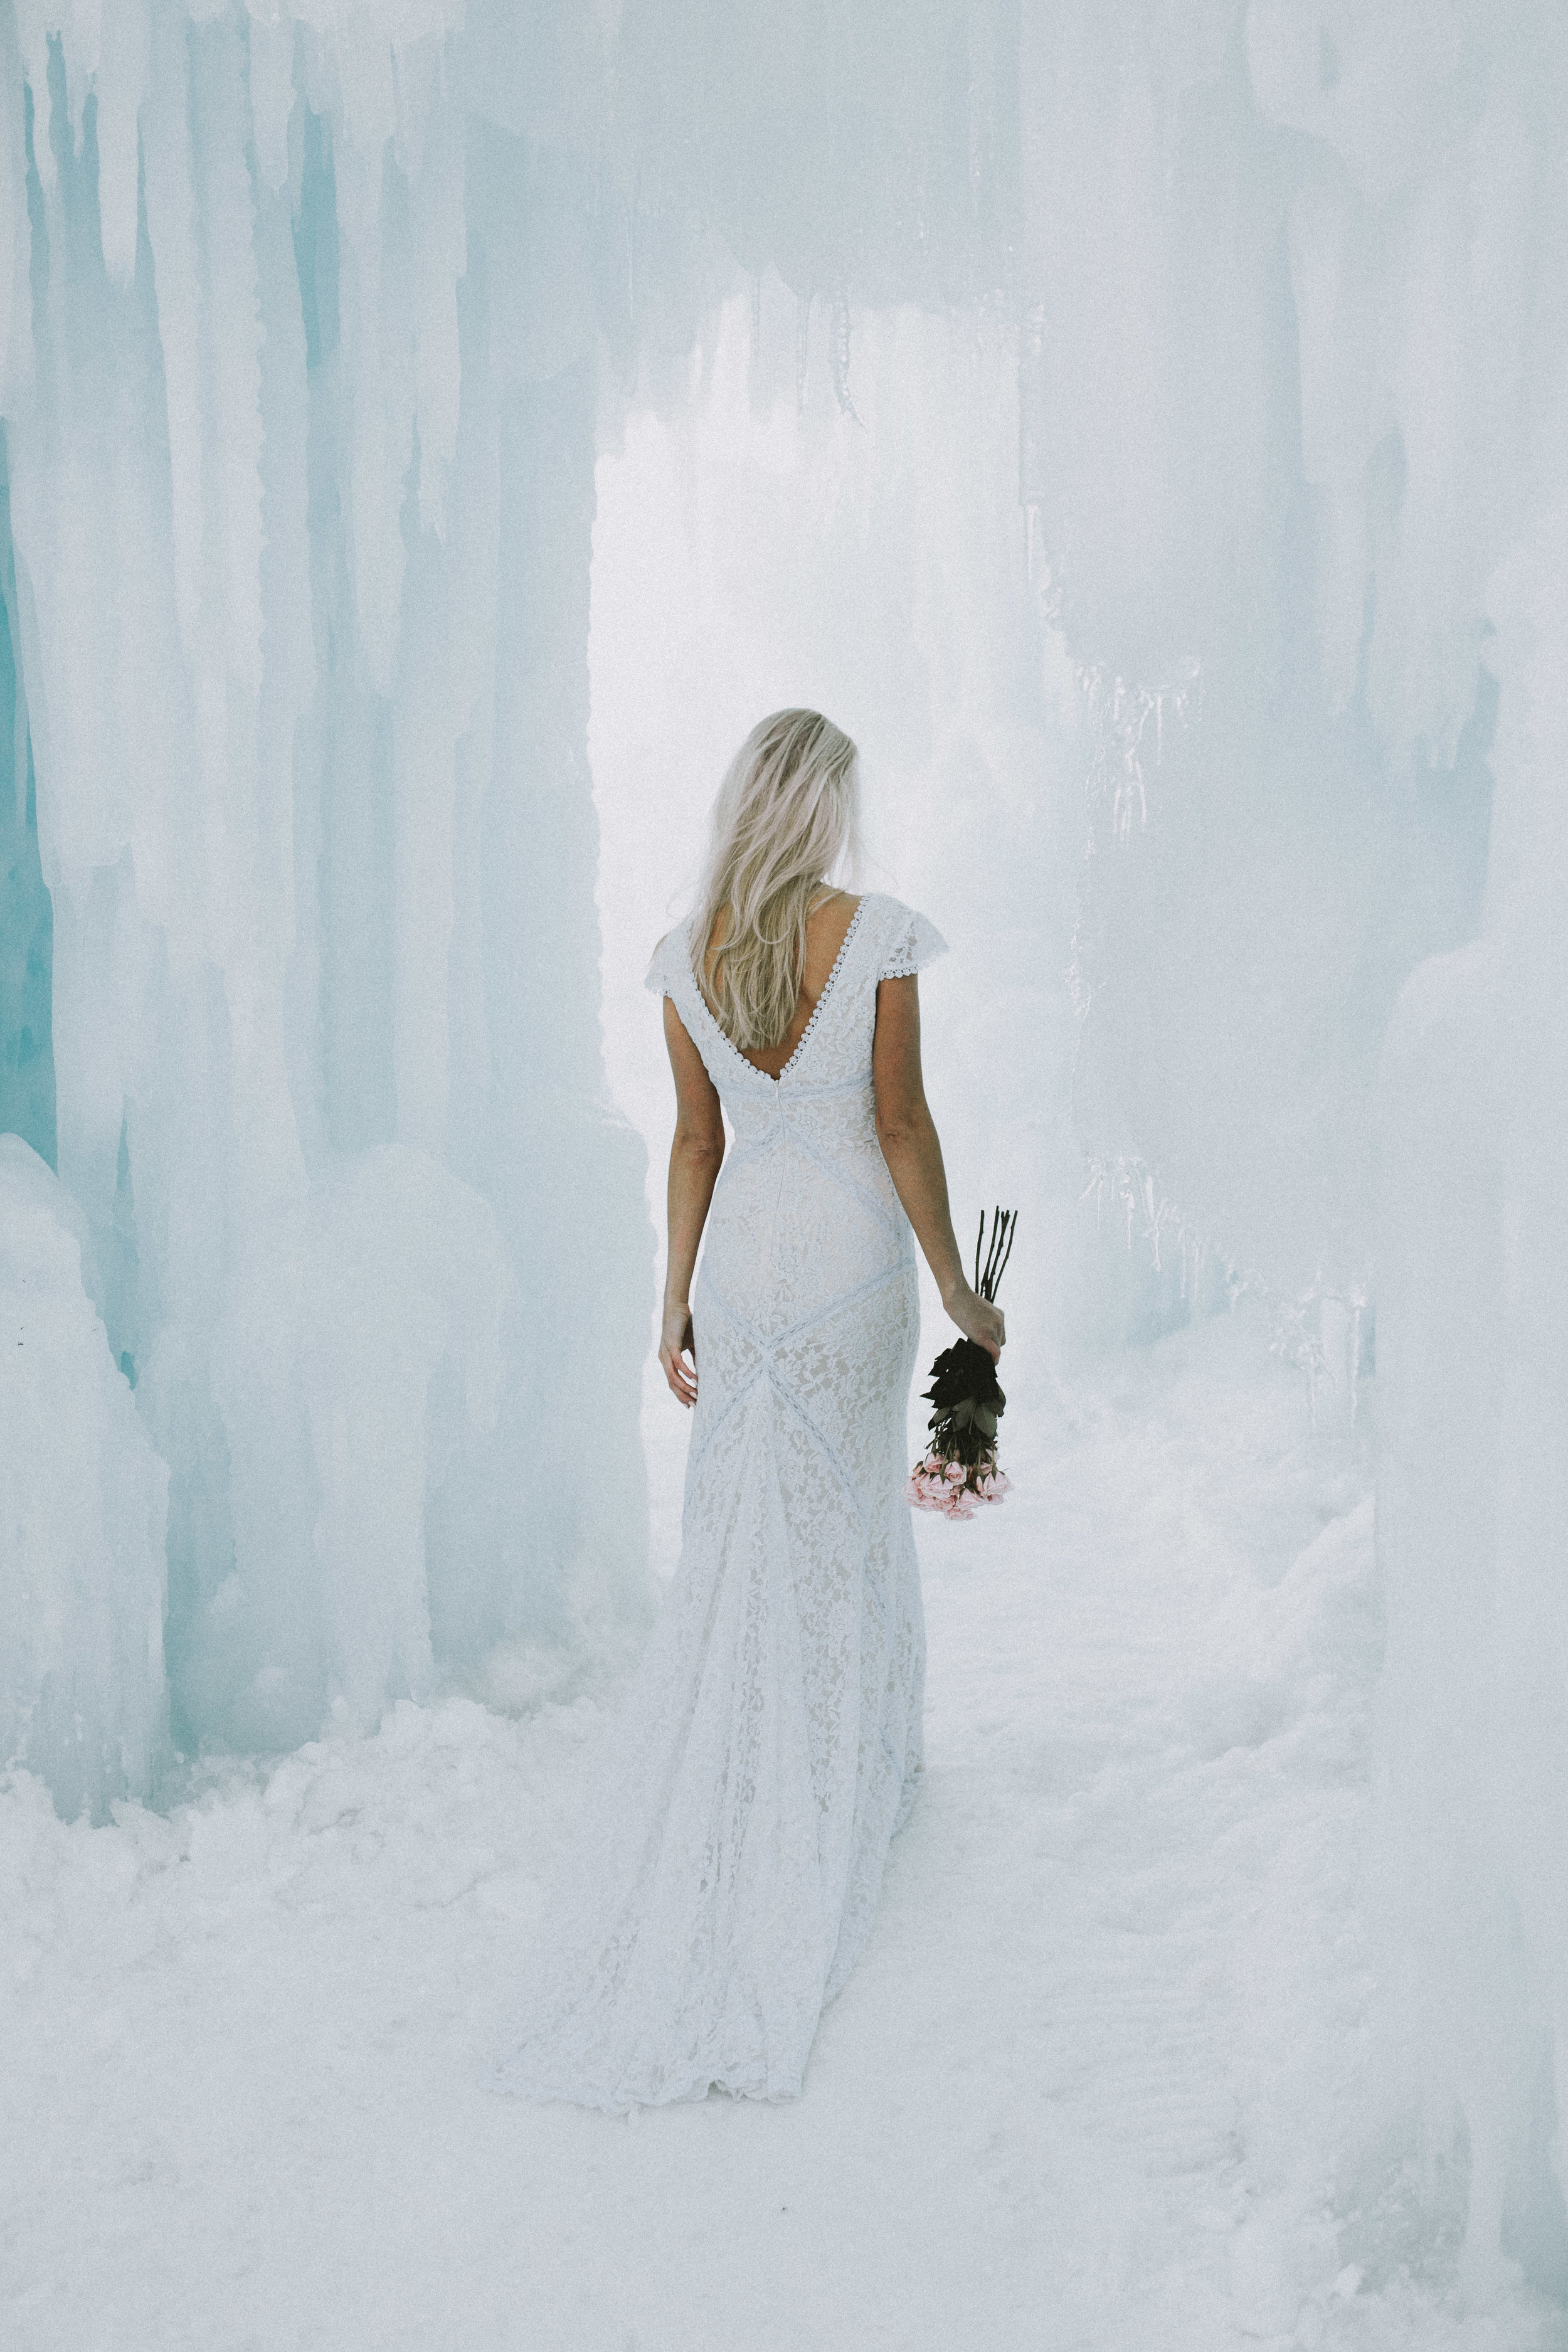 SAMLANDRETH-ice-69.jpg